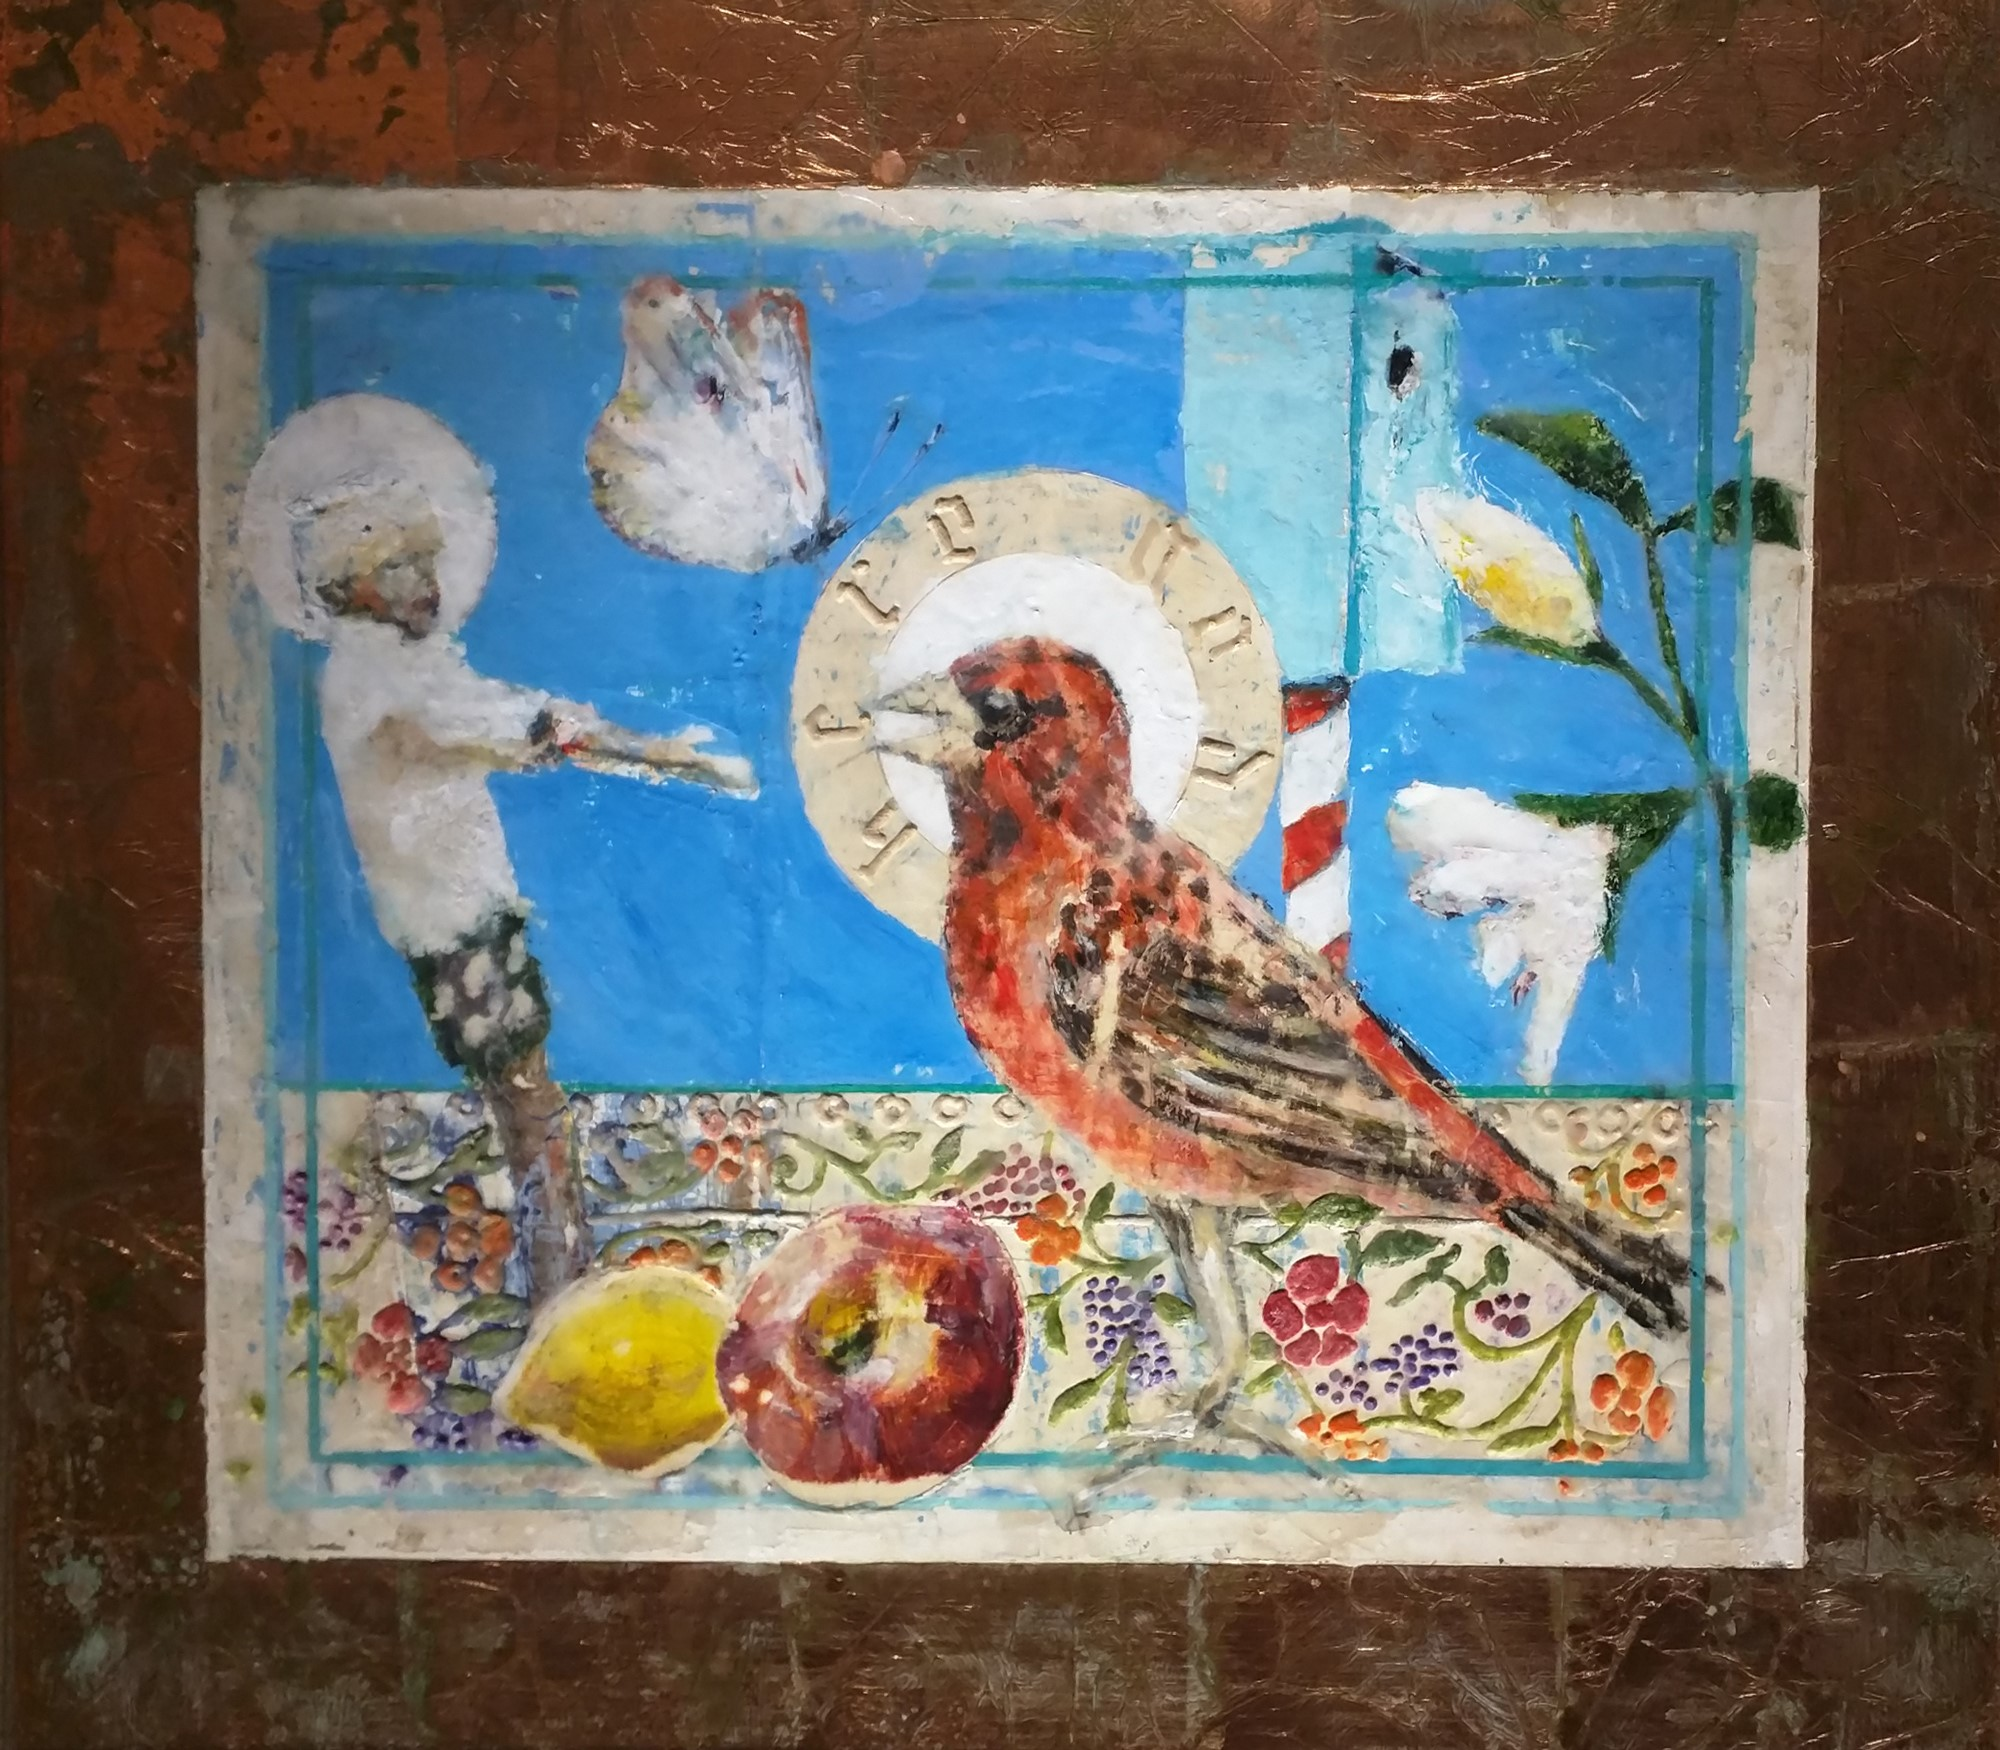 Still Life for Bird Temple #2 by Mark Gaskin